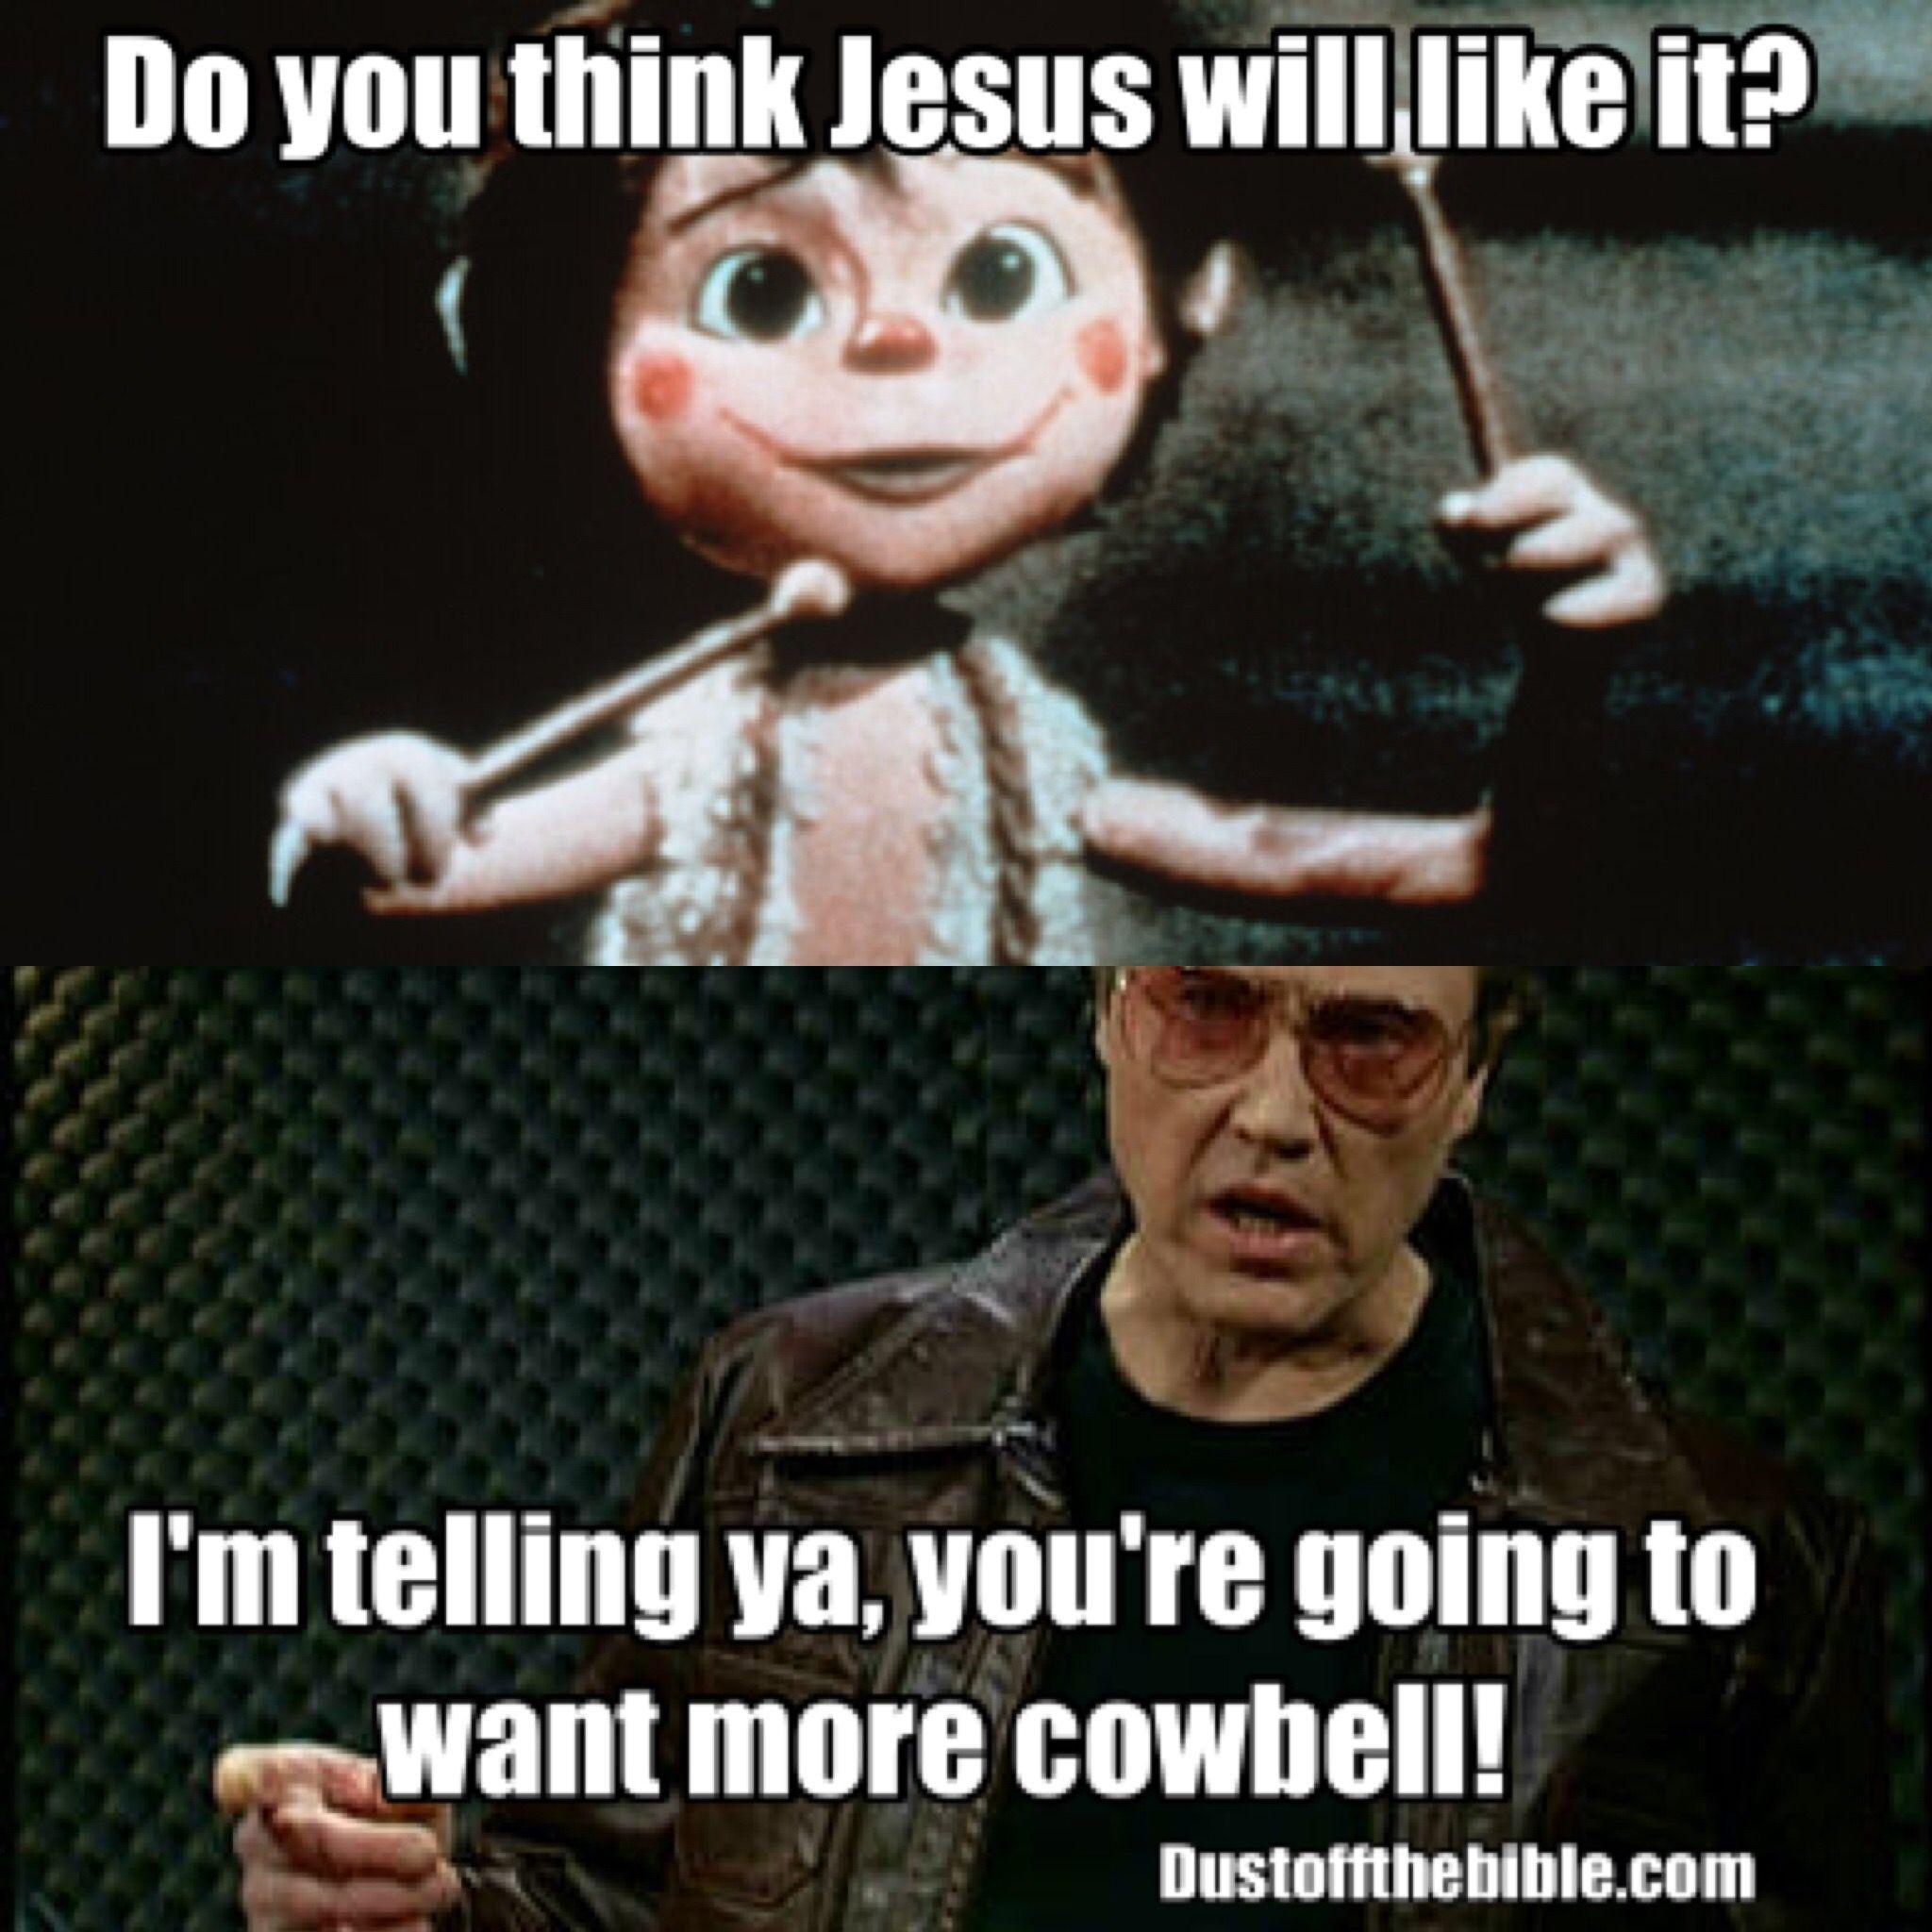 More cowbell Christmas meme #christmas #memes | Christian memes ...